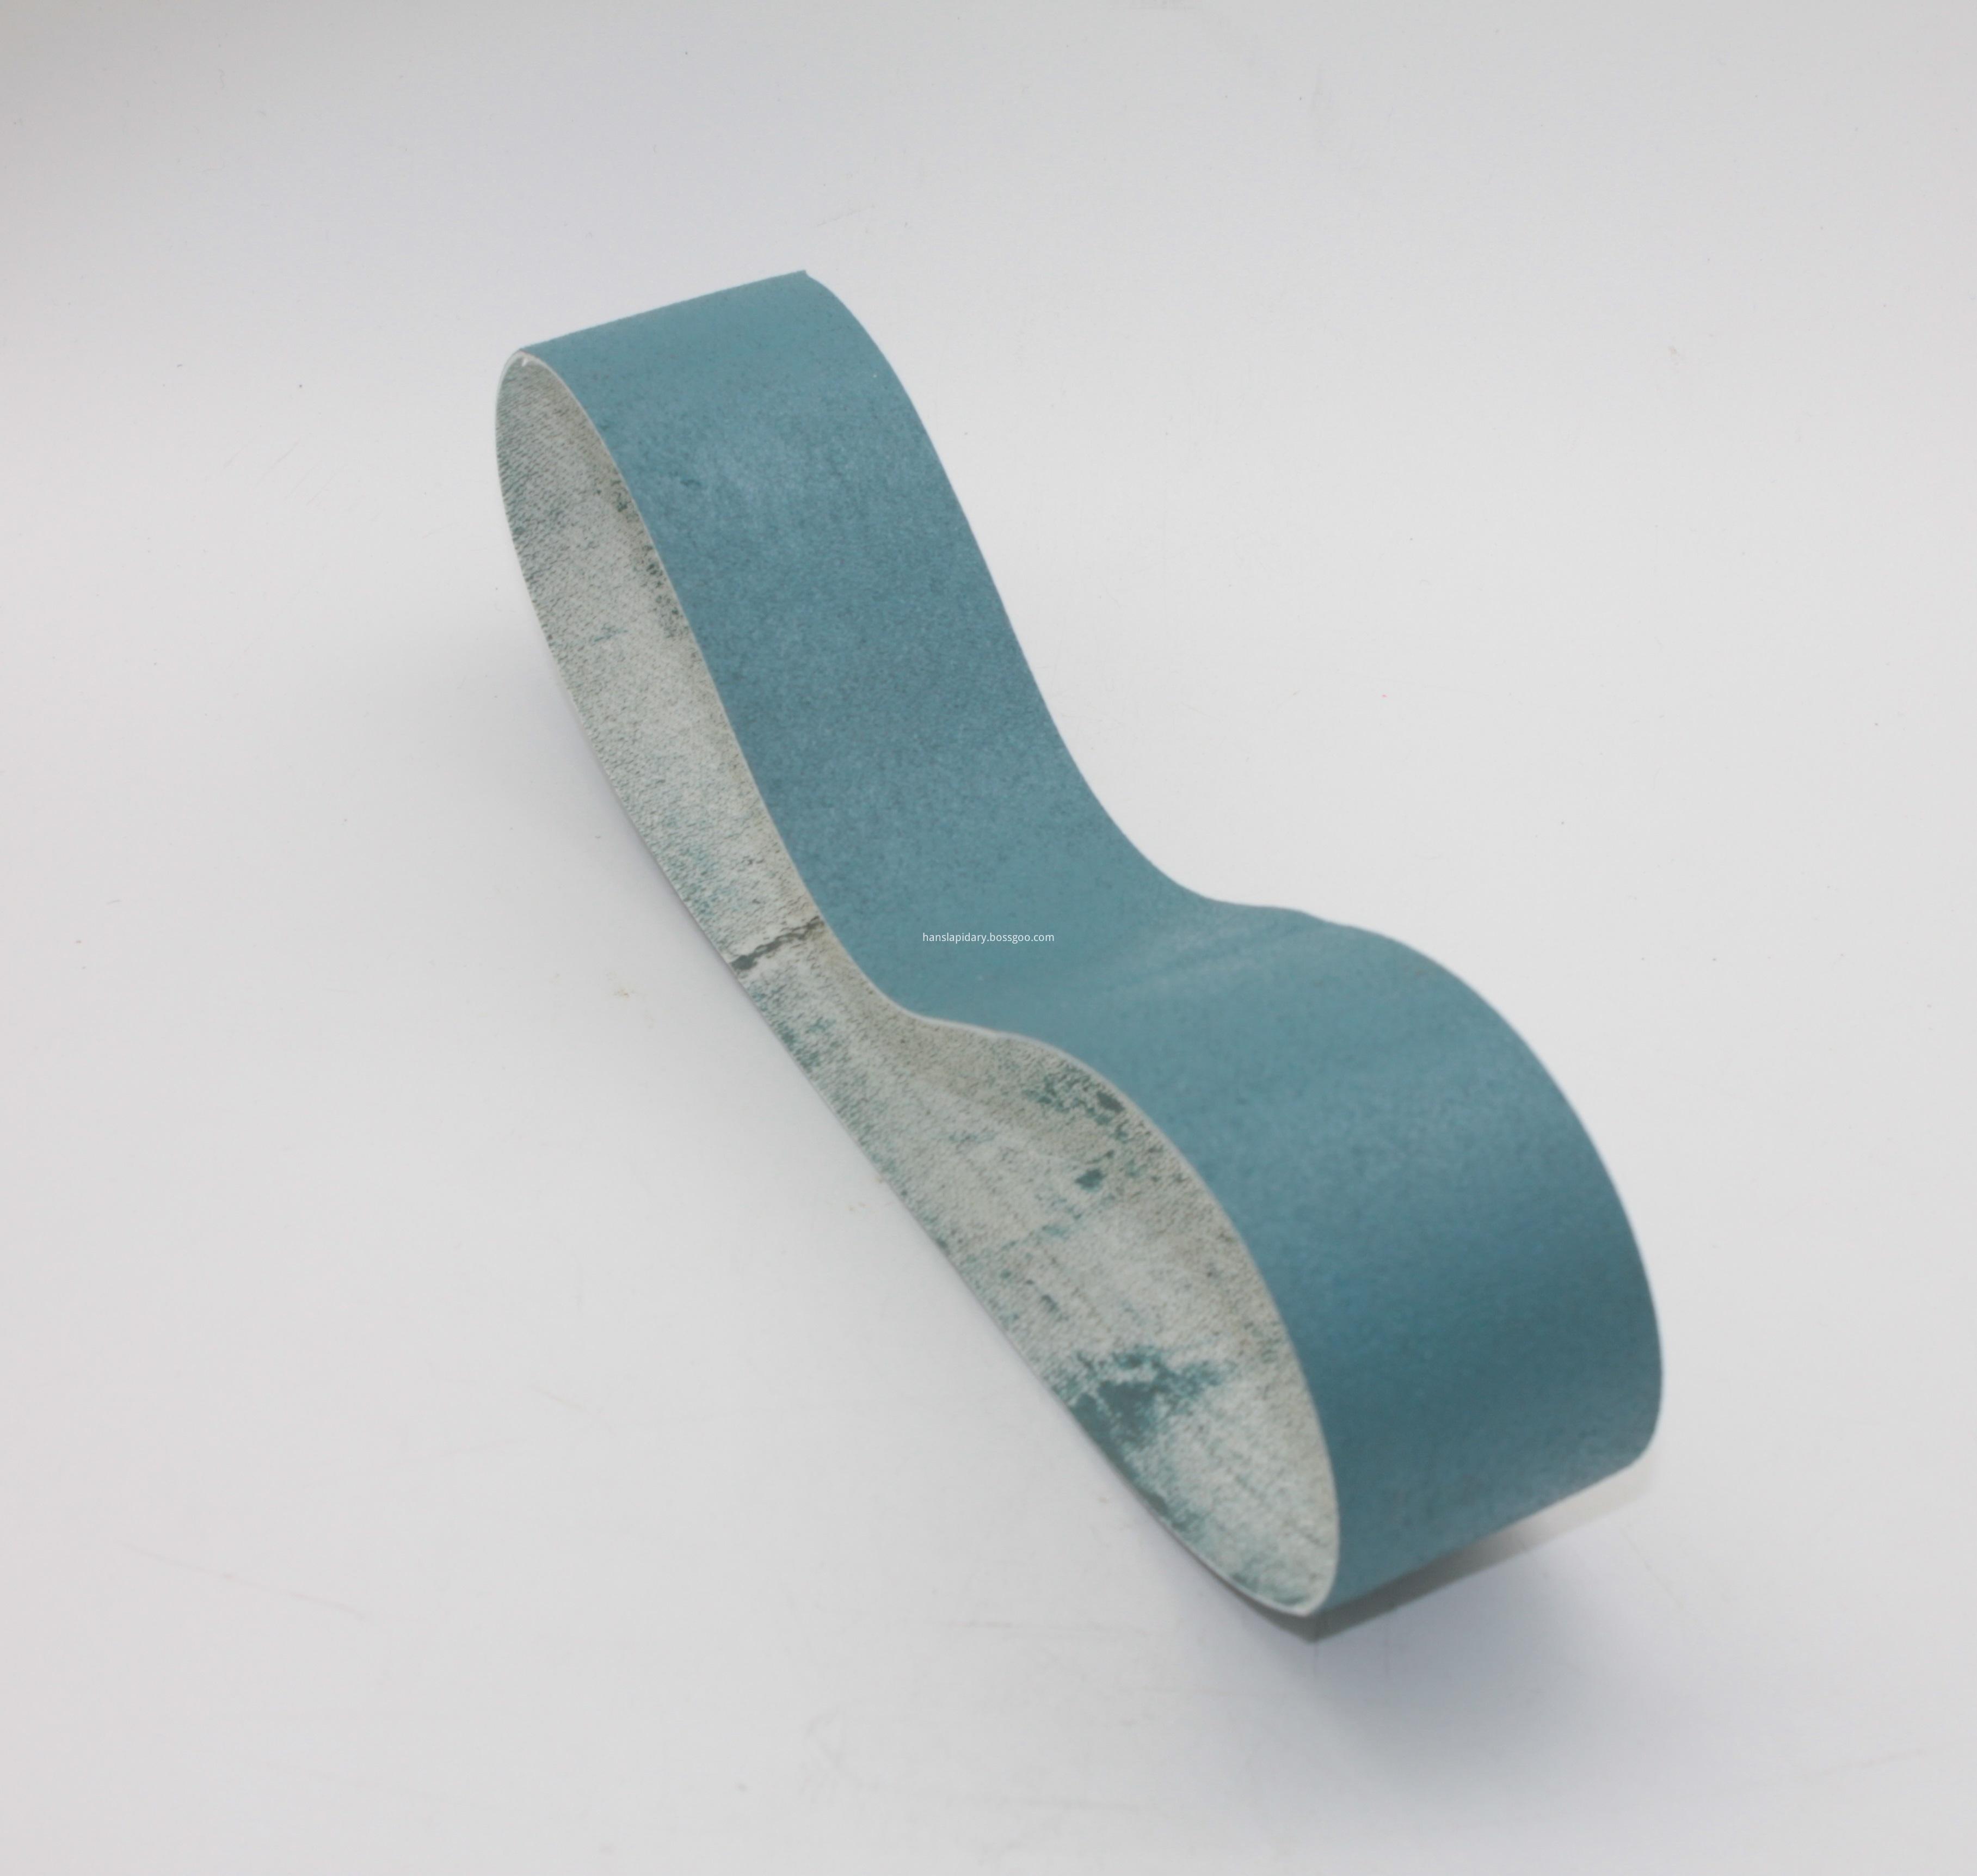 Diamond Lapidary Sanding Belt